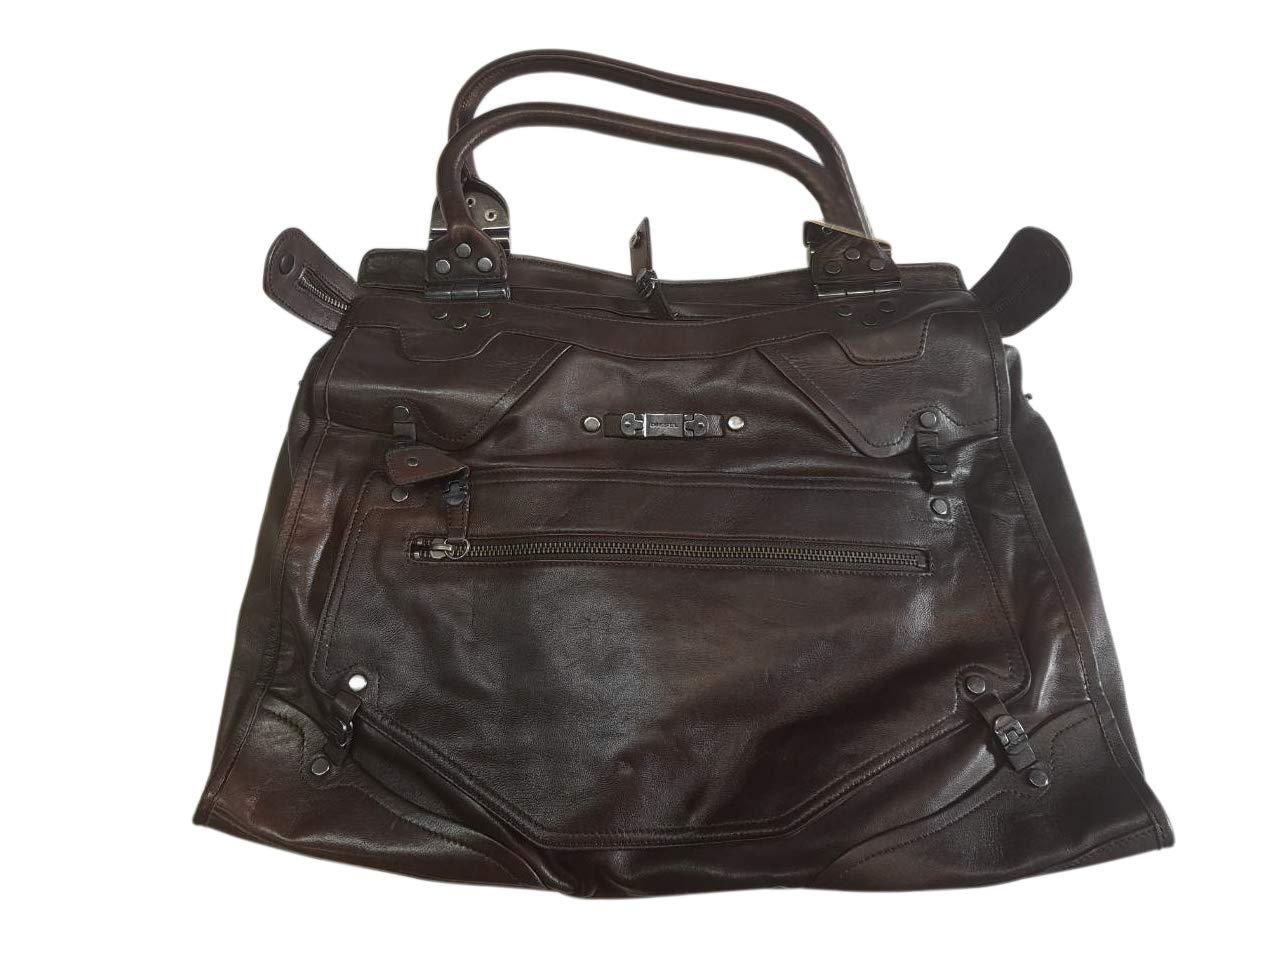 Diesel Handbag 00XA98PR441T2154 Bagage Cabine, 30 cm, 6 liters, Noir (Schwarz)